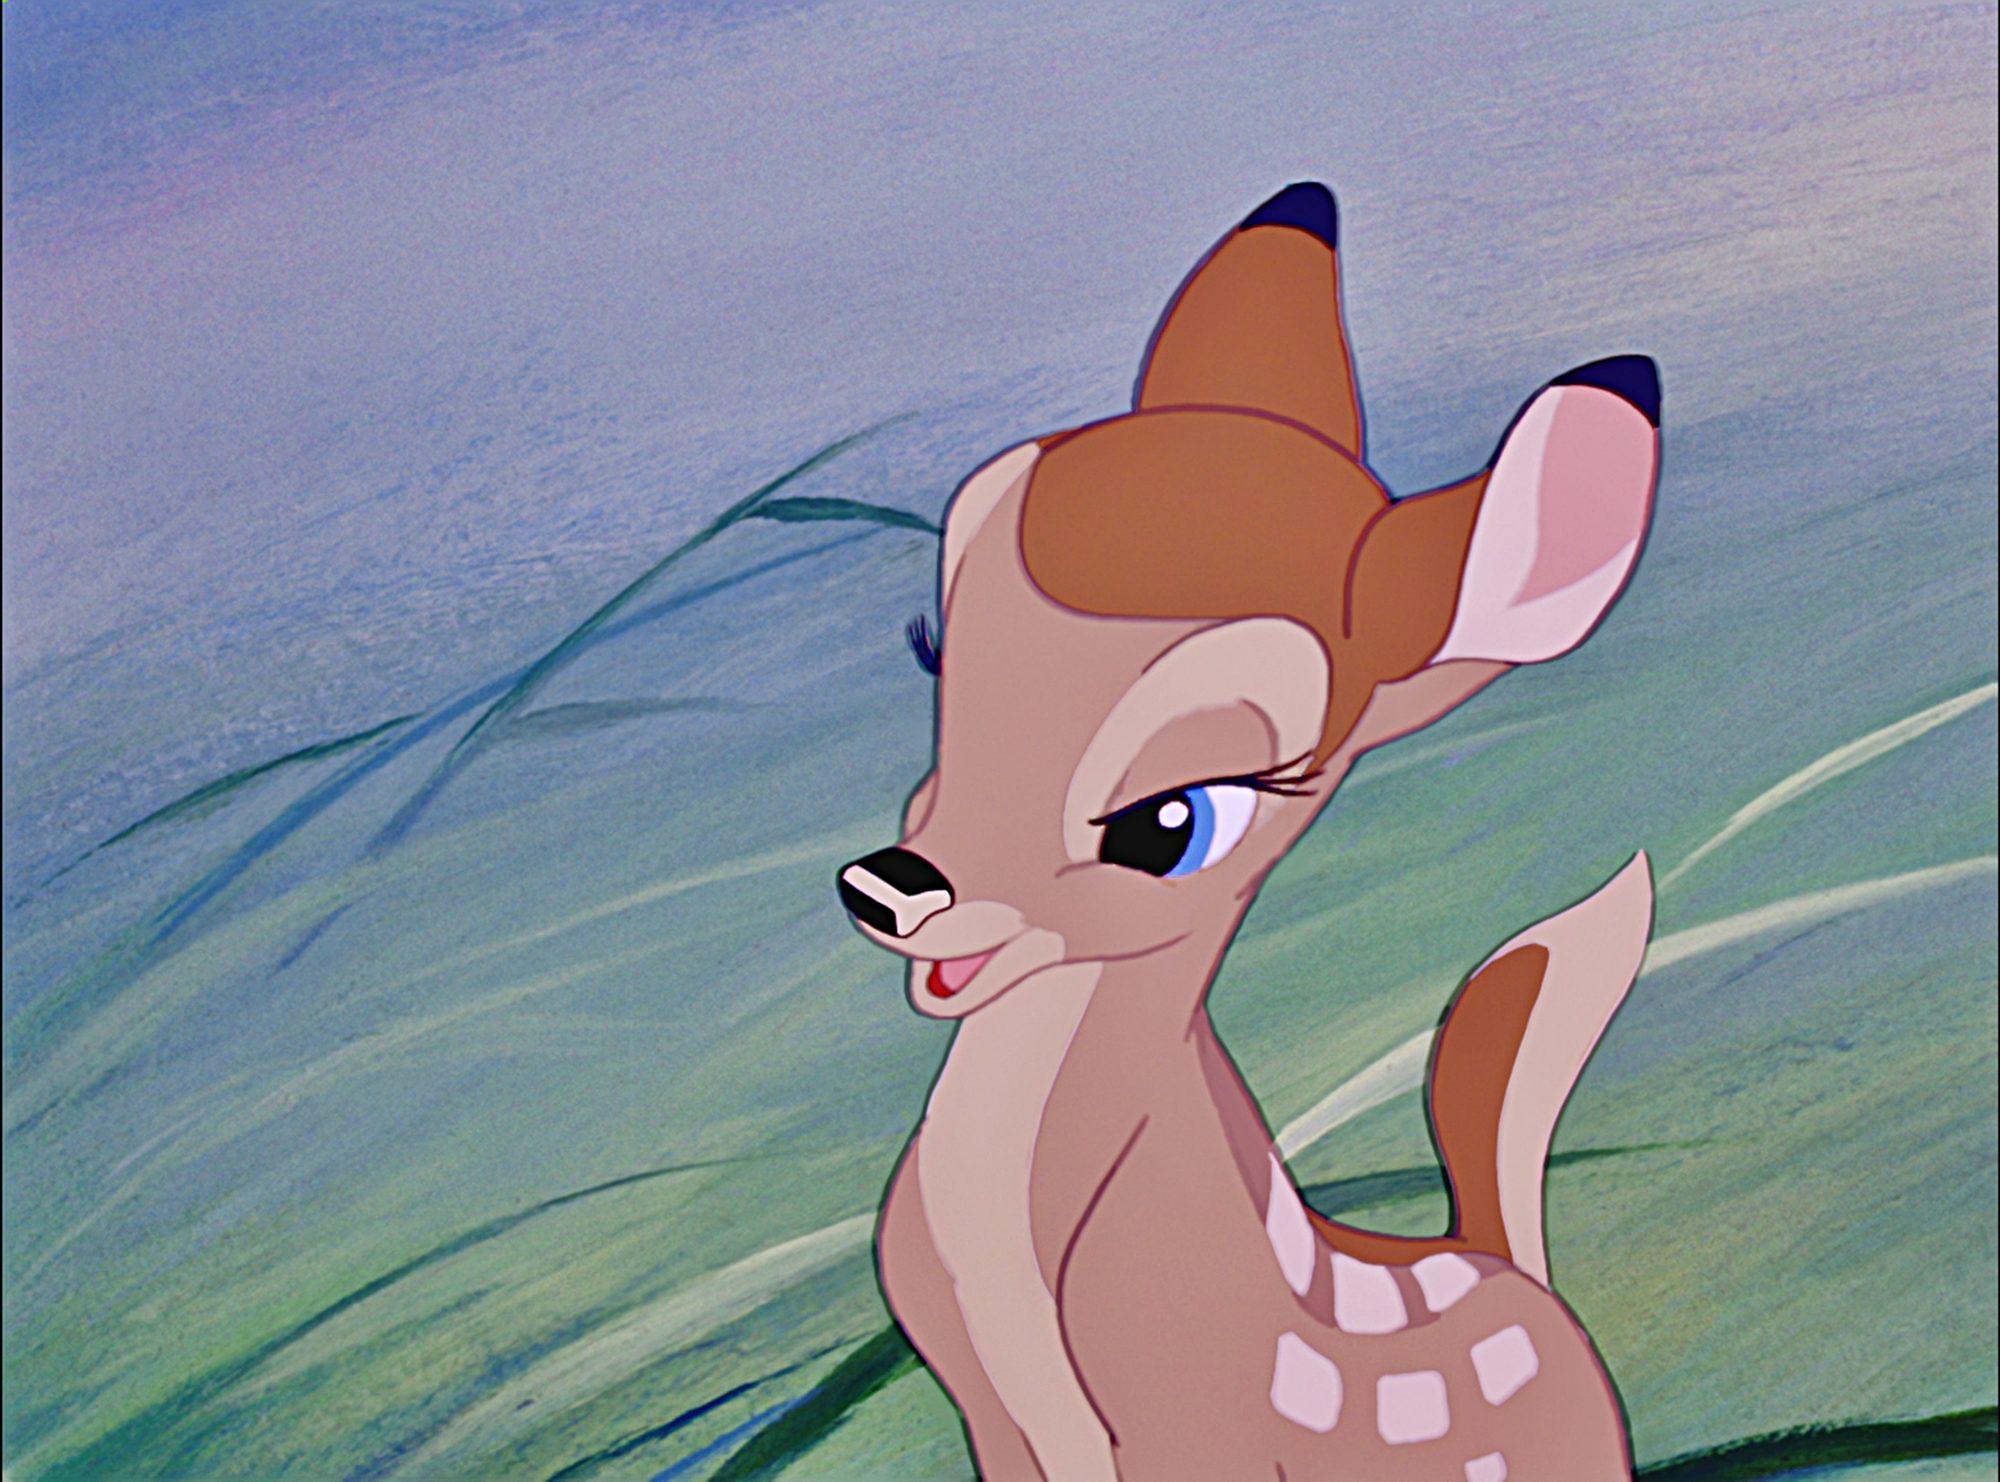 Walt-Disney-Screencaps-Faline-walt-disney-characters-35463067-4371-3240